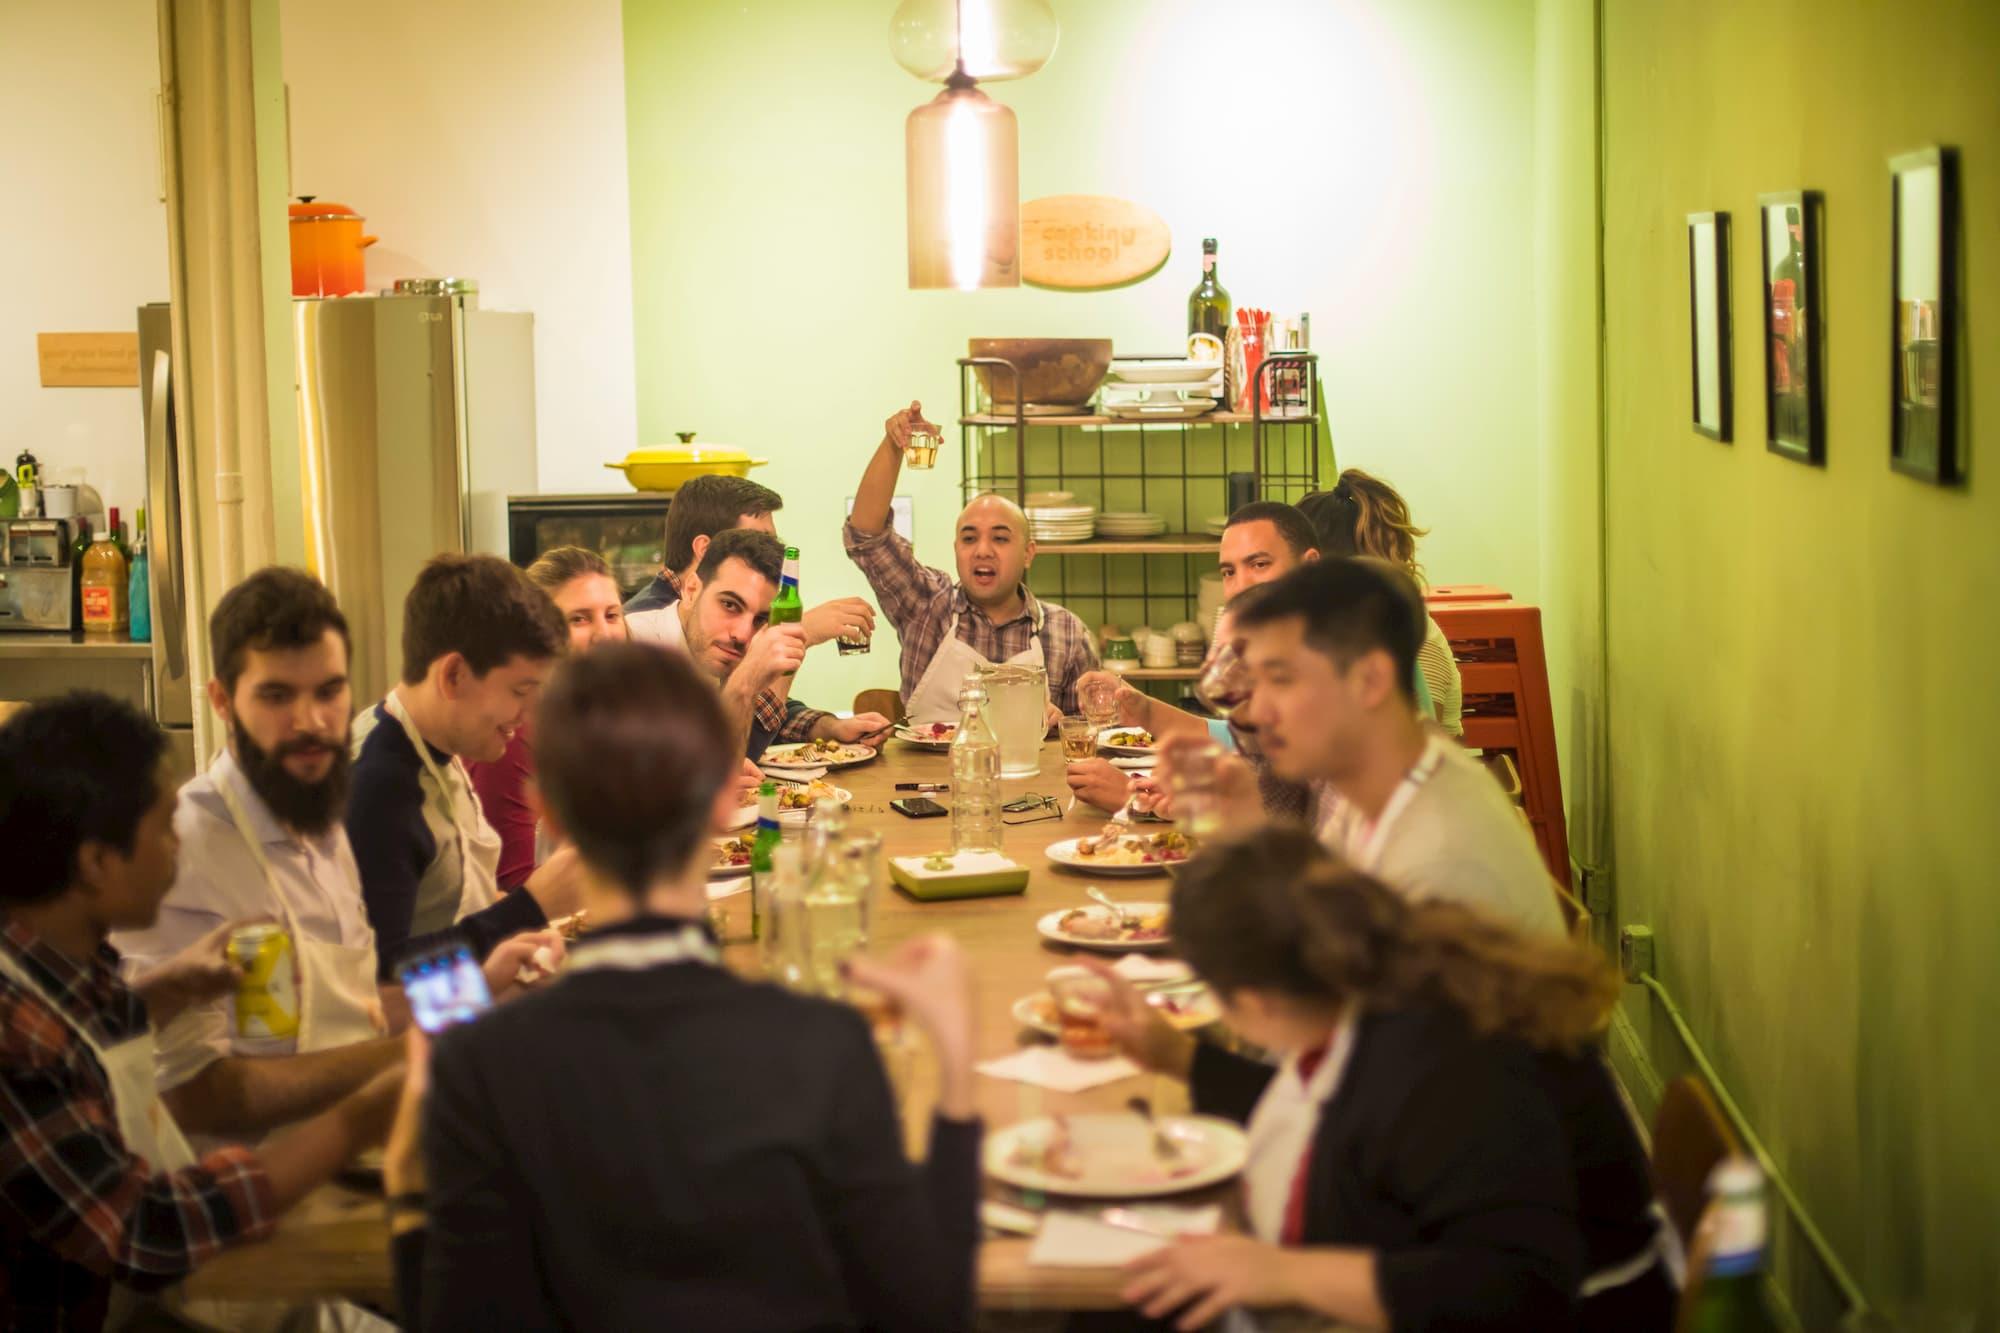 Ollie_Social_Events_Dinner.jpg